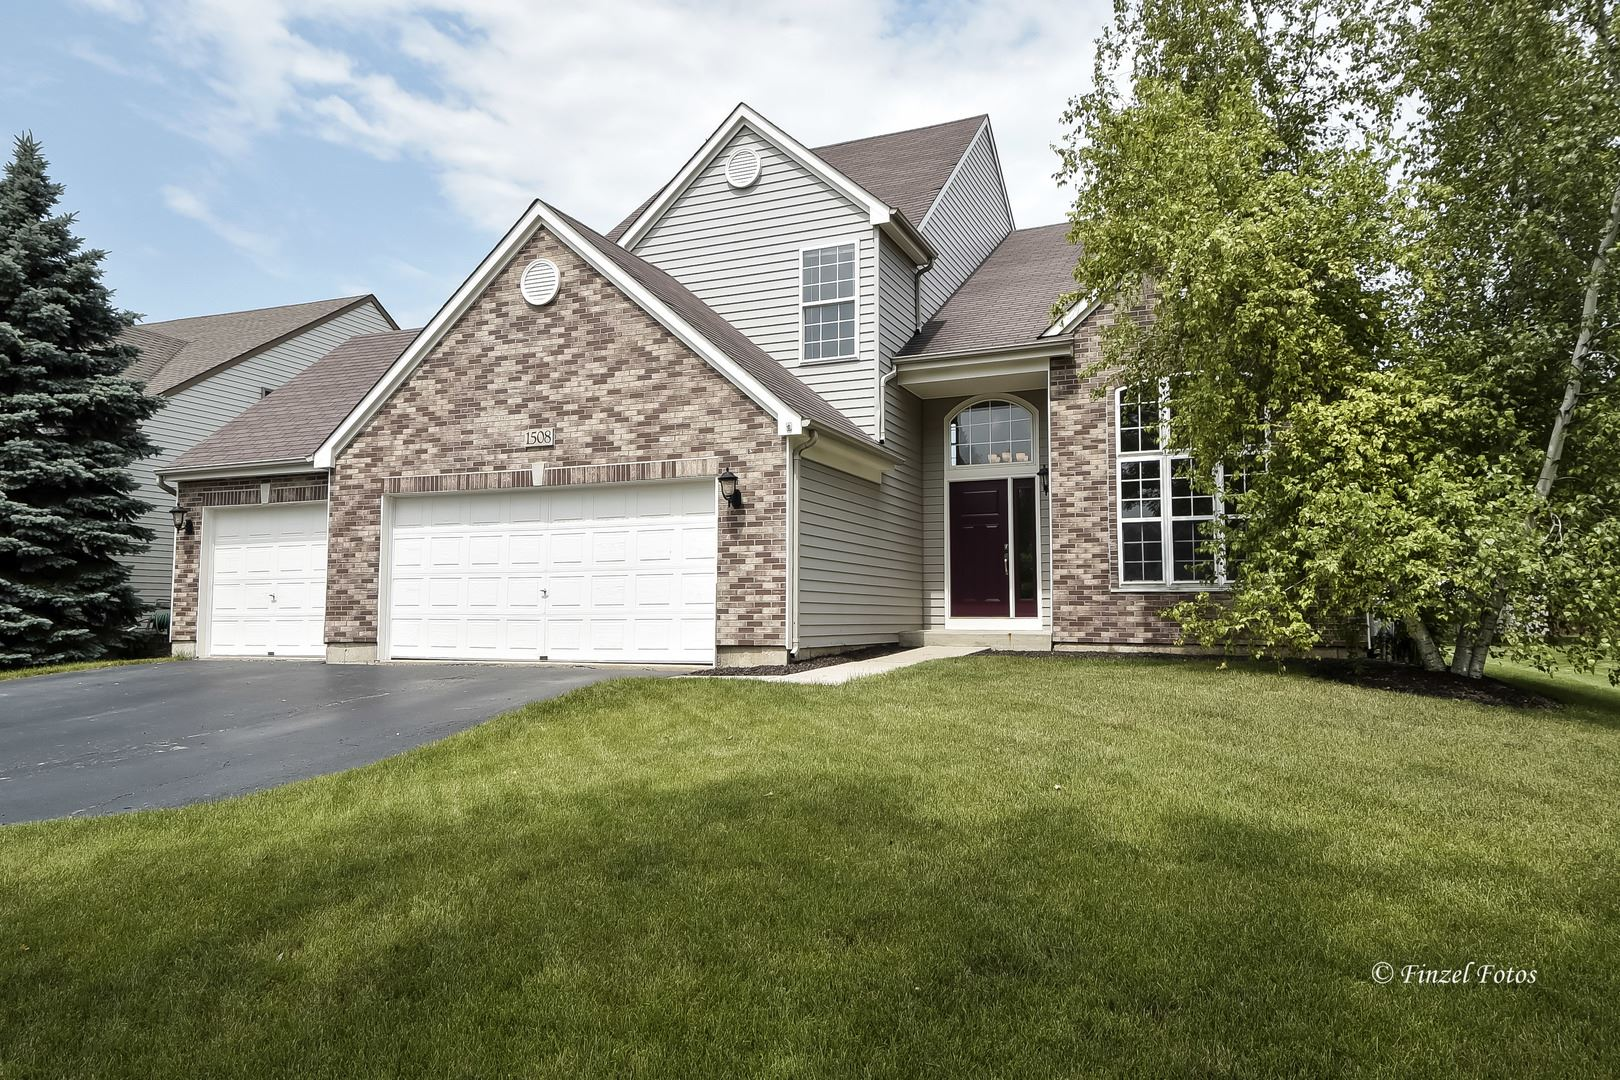 1508 Trailwood Drive, Crystal Lake, IL 60014 - #: 10777338